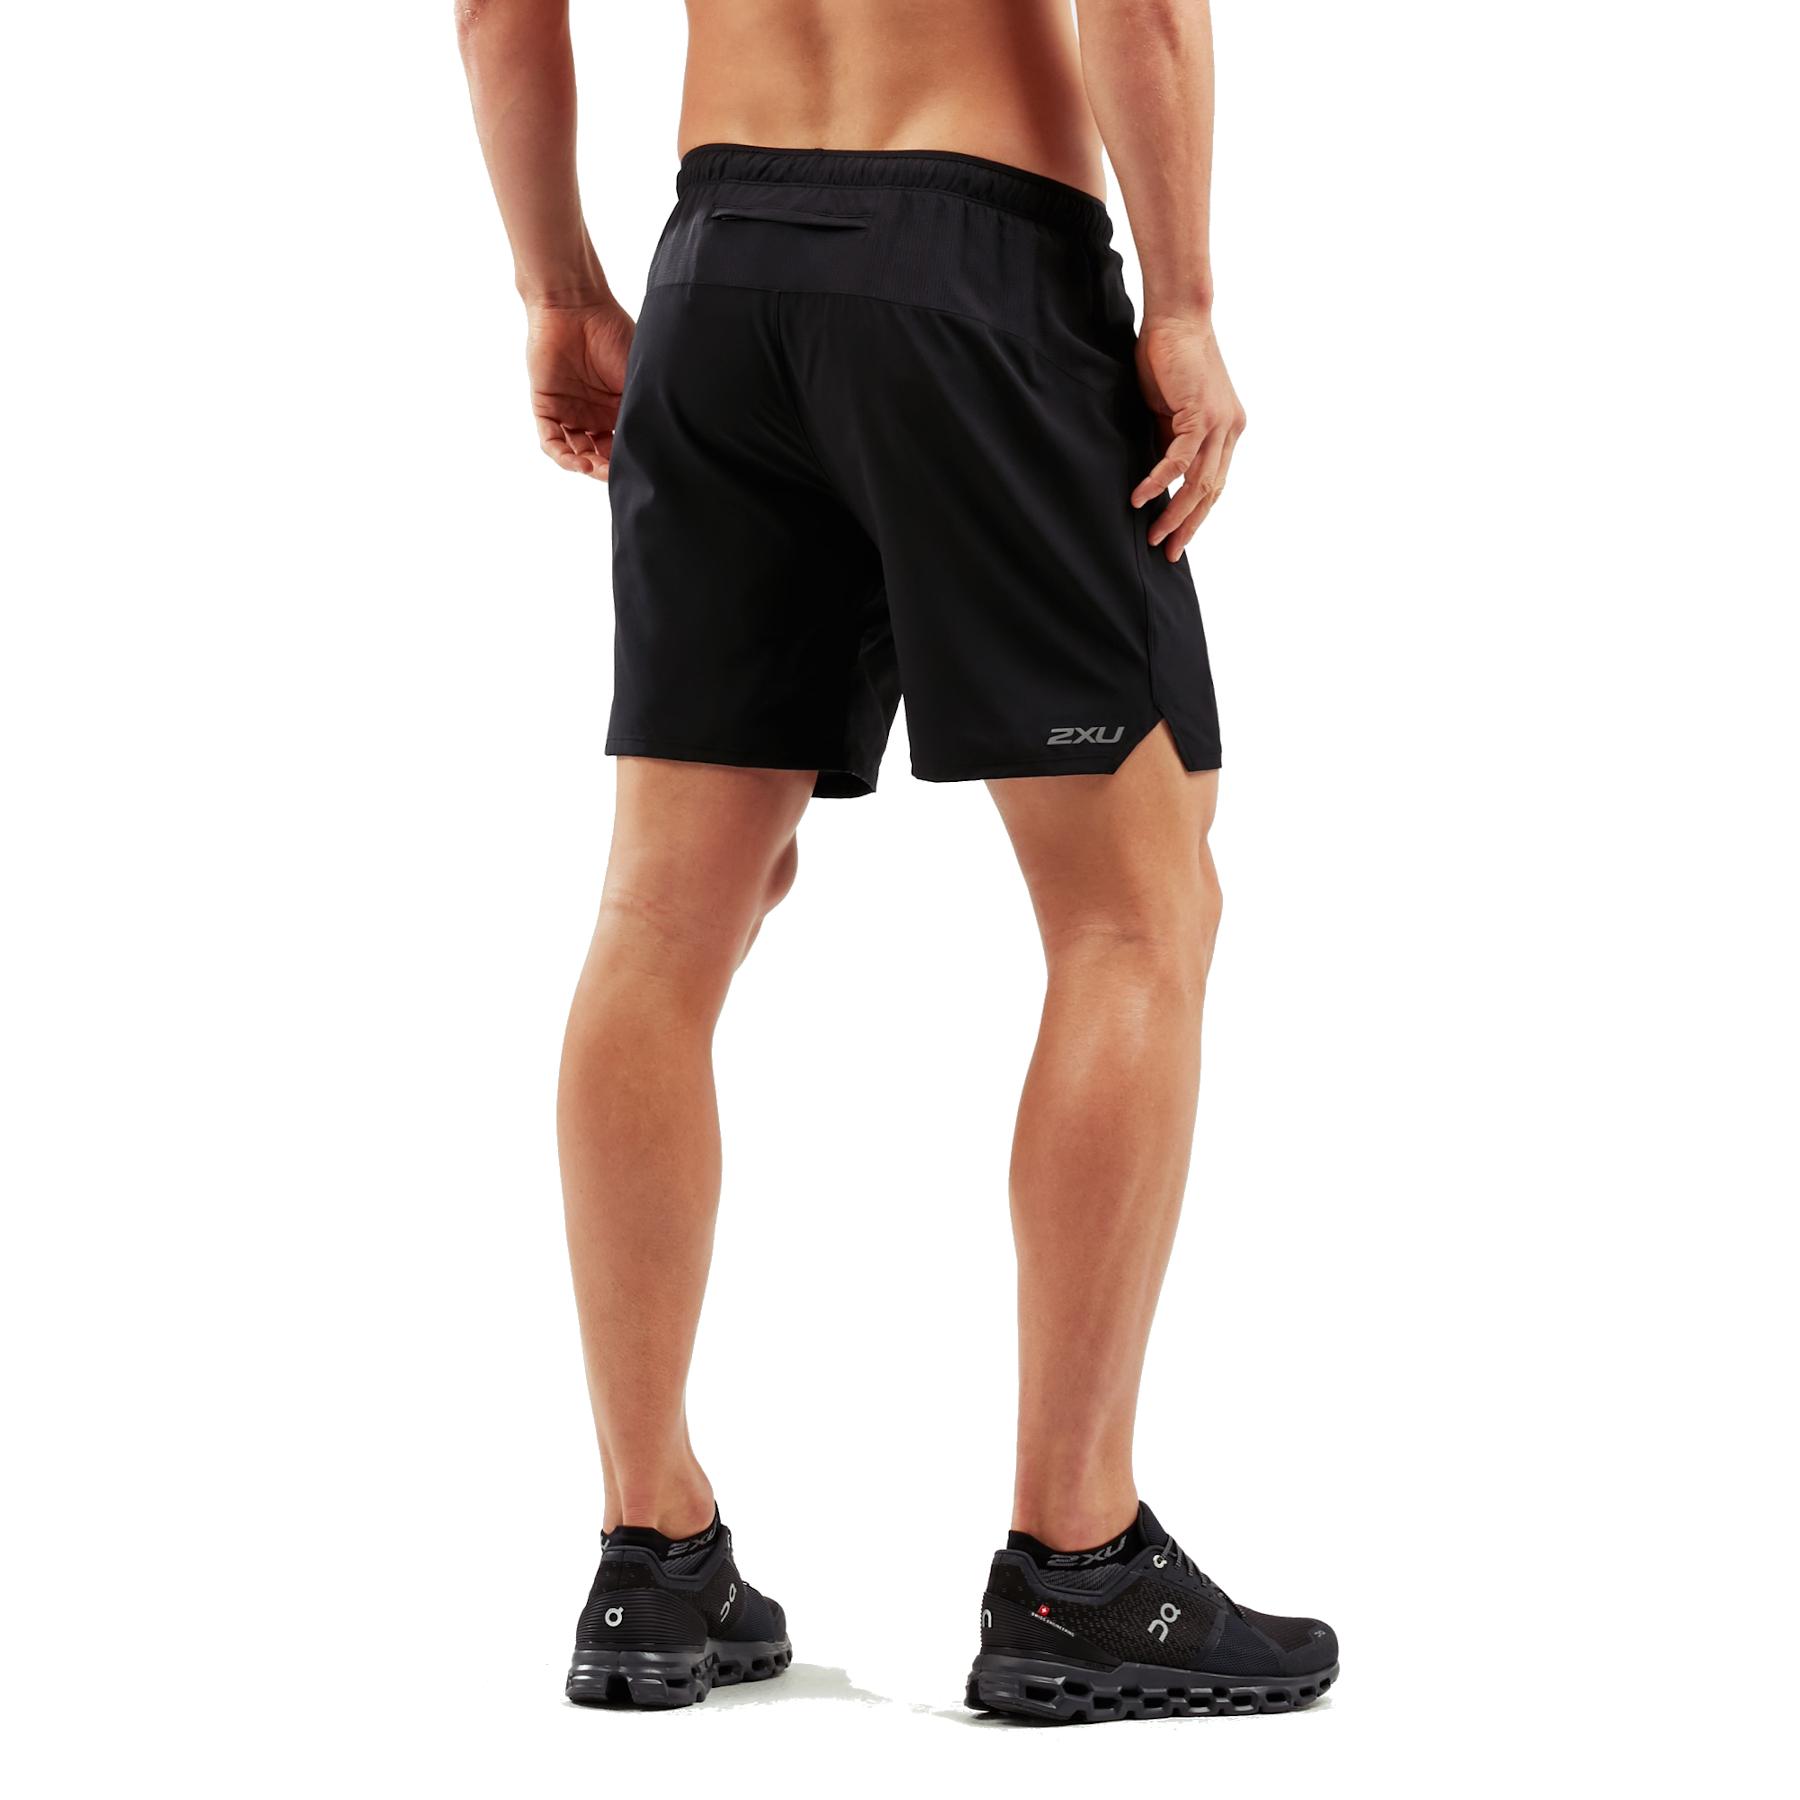 "Imagen de 2XU XVENT 7"" Free Shorts with Brief - black/silver reflective"